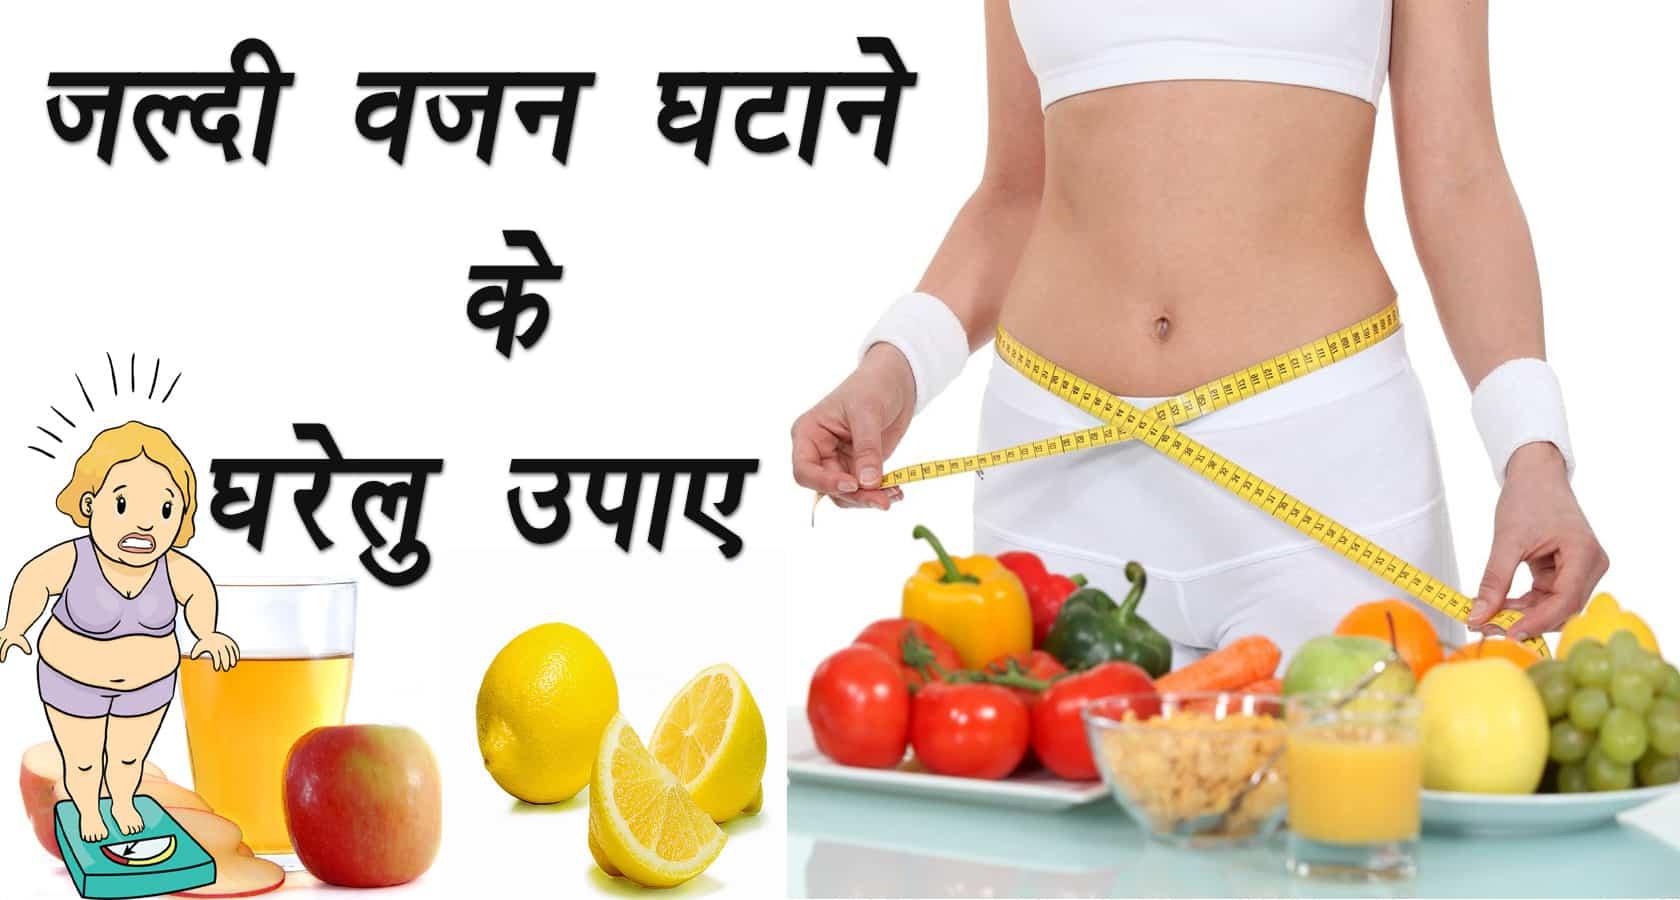 वजन कम के उपाय, Weight Loss tips in Hindi